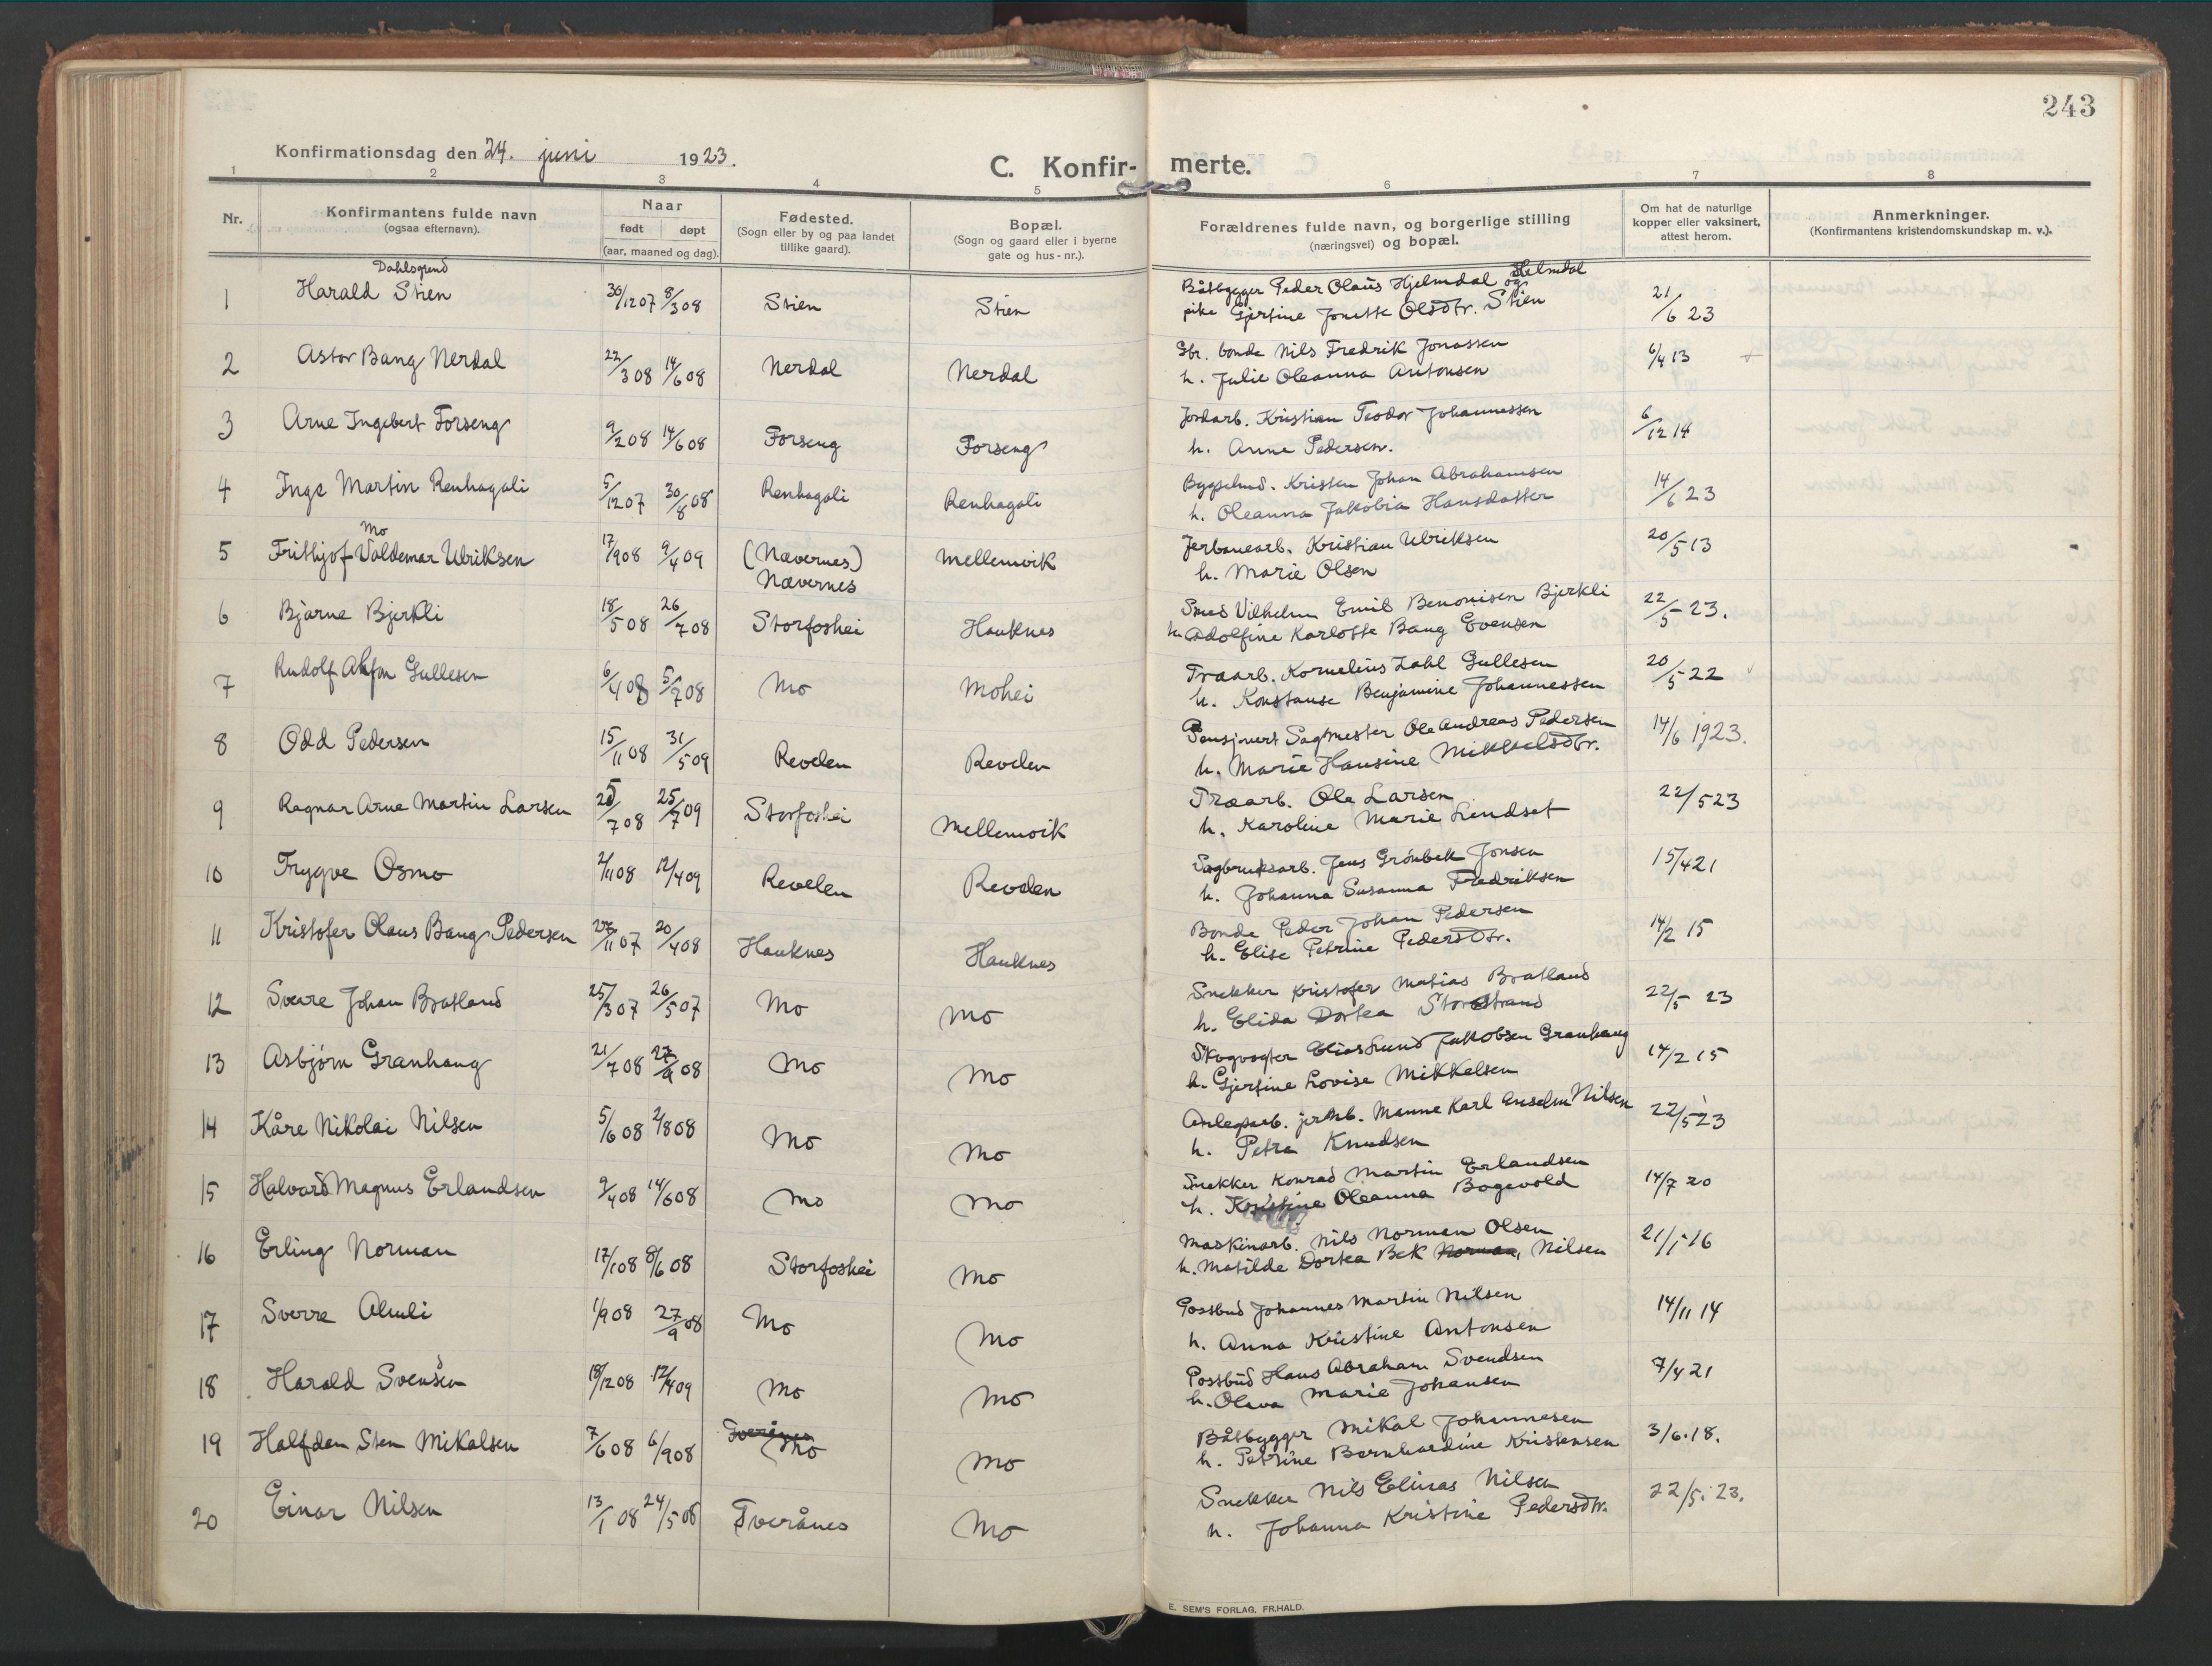 SAT, Ministerialprotokoller, klokkerbøker og fødselsregistre - Nordland, 827/L0404: Ministerialbok nr. 827A16, 1912-1925, s. 243